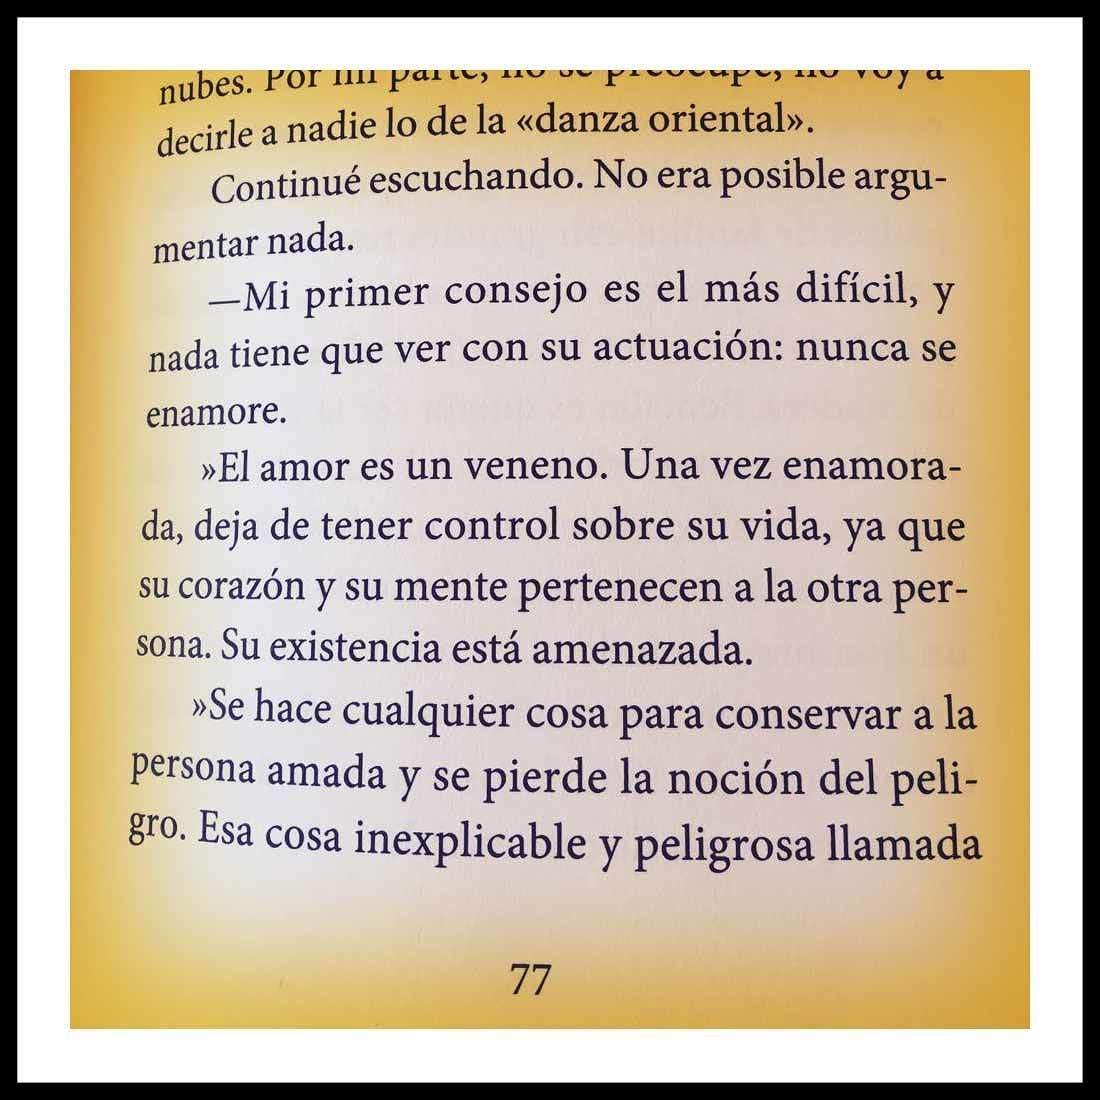 Esa cosa inexplicable y peligrosa llamada amor La espa de PauloCoelho va